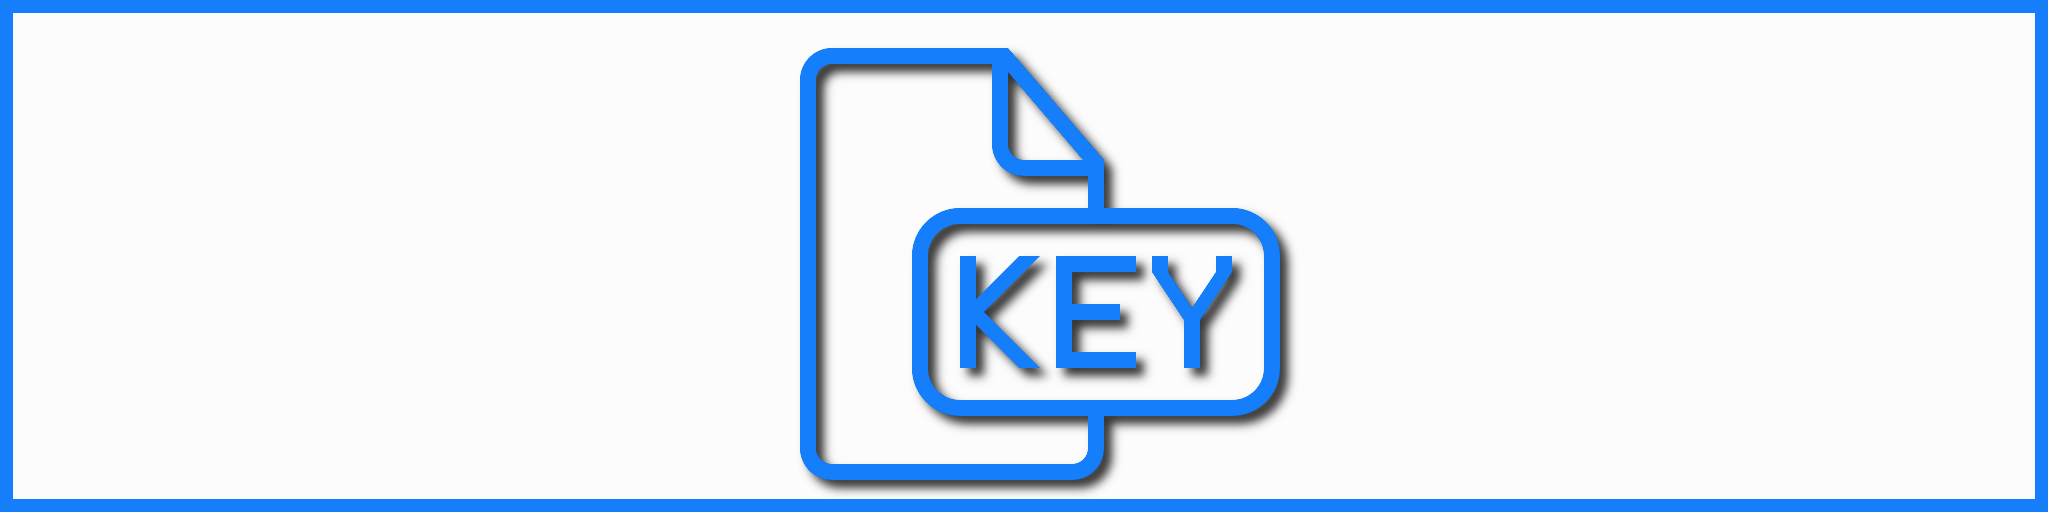 license activation banner logo